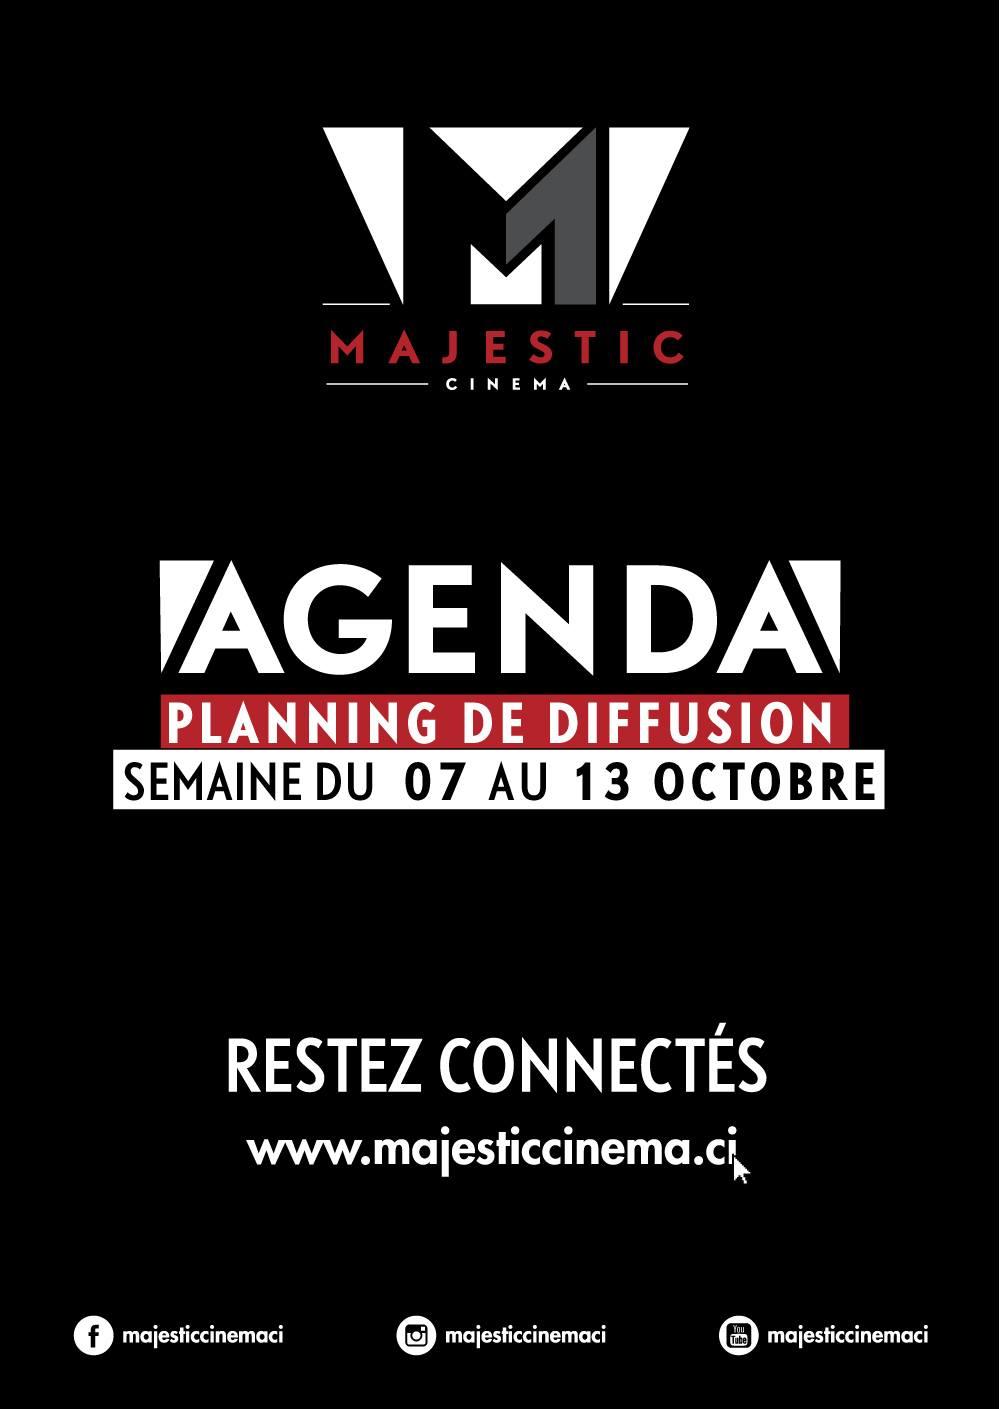 Programme du 7 au 13 octobre, Majestic, Abidjan, Serialfoodie